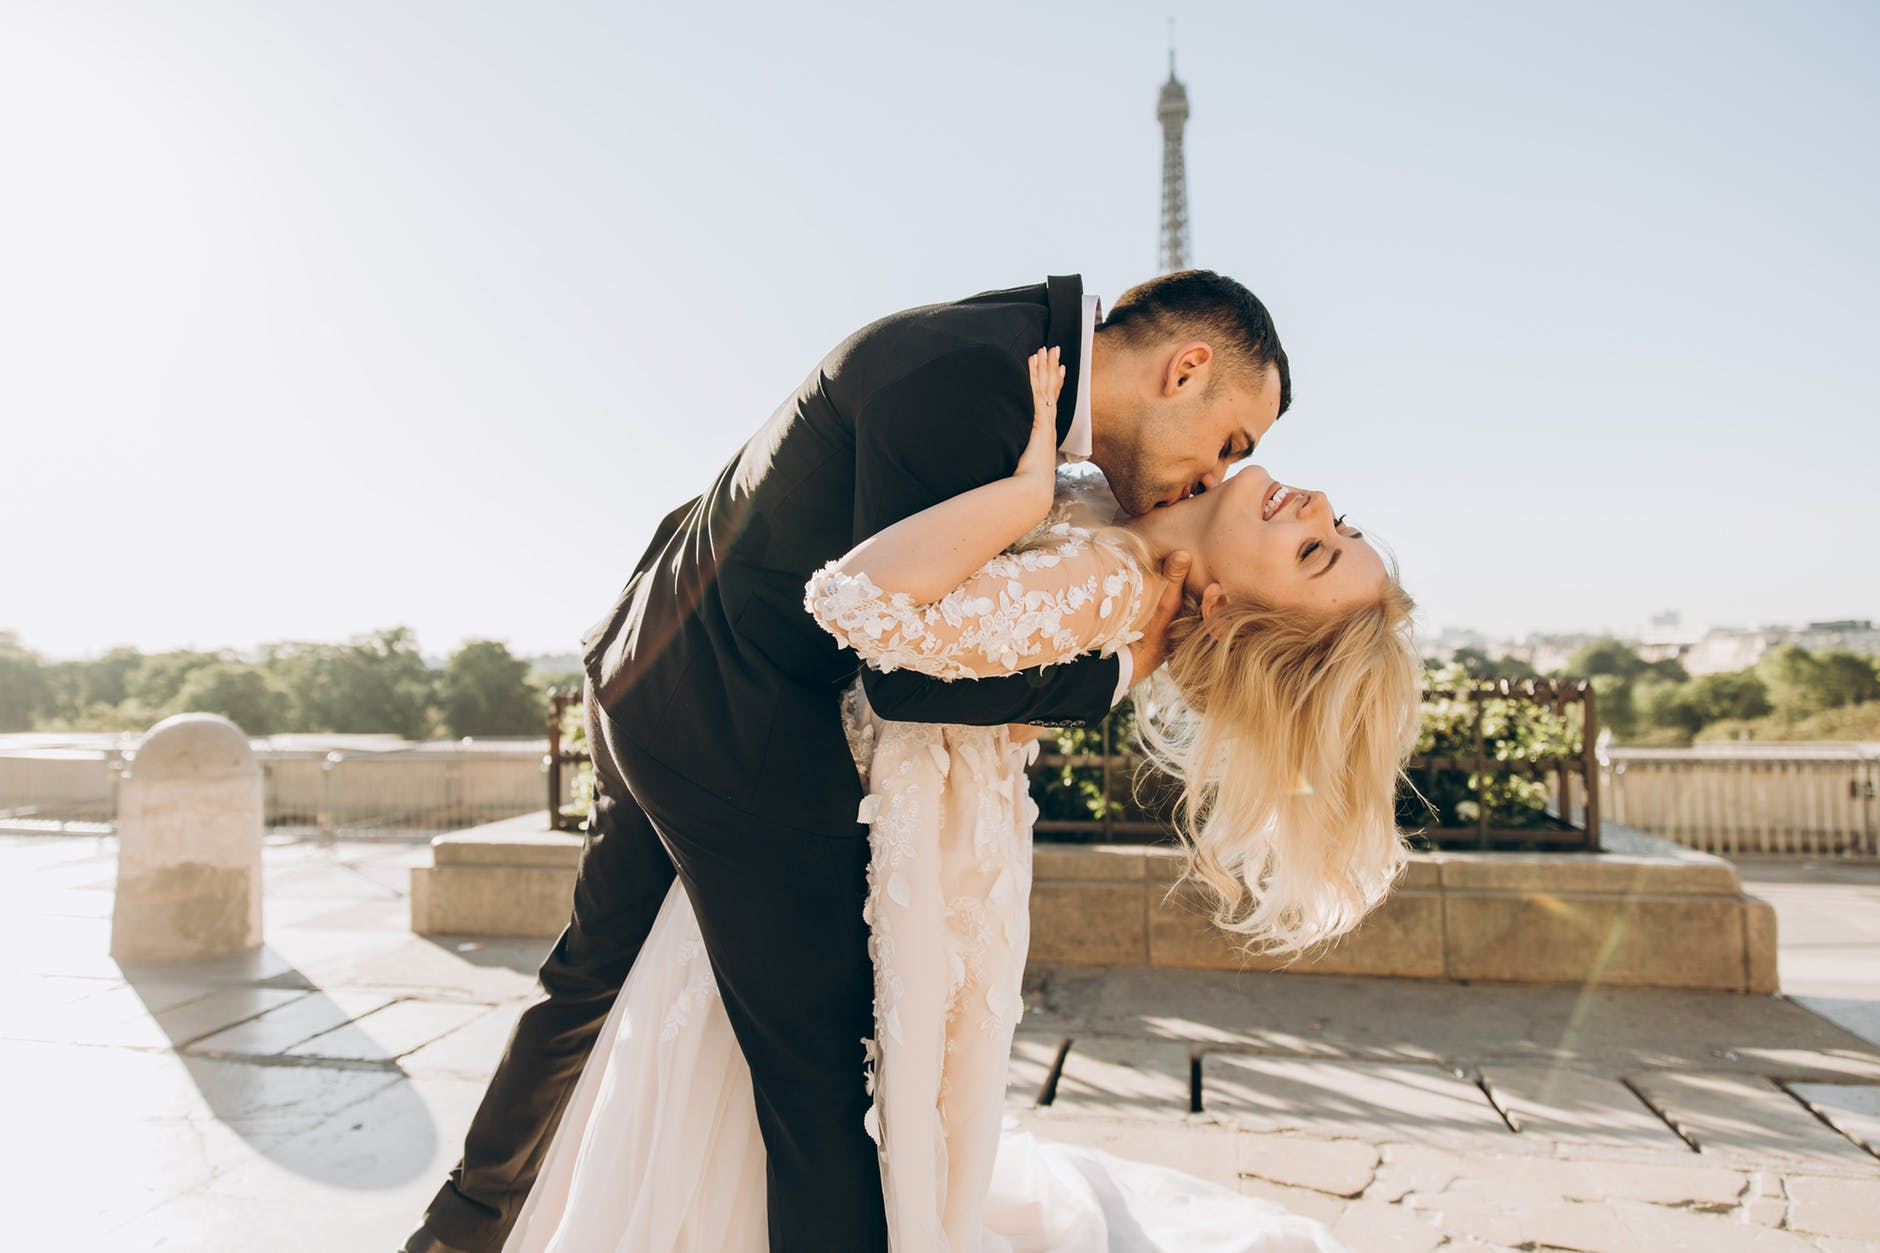 Learn How to Create the Best Wedding Invitations for Your Big Day #wedding #weddinginvitations #invitations #weddingplanning